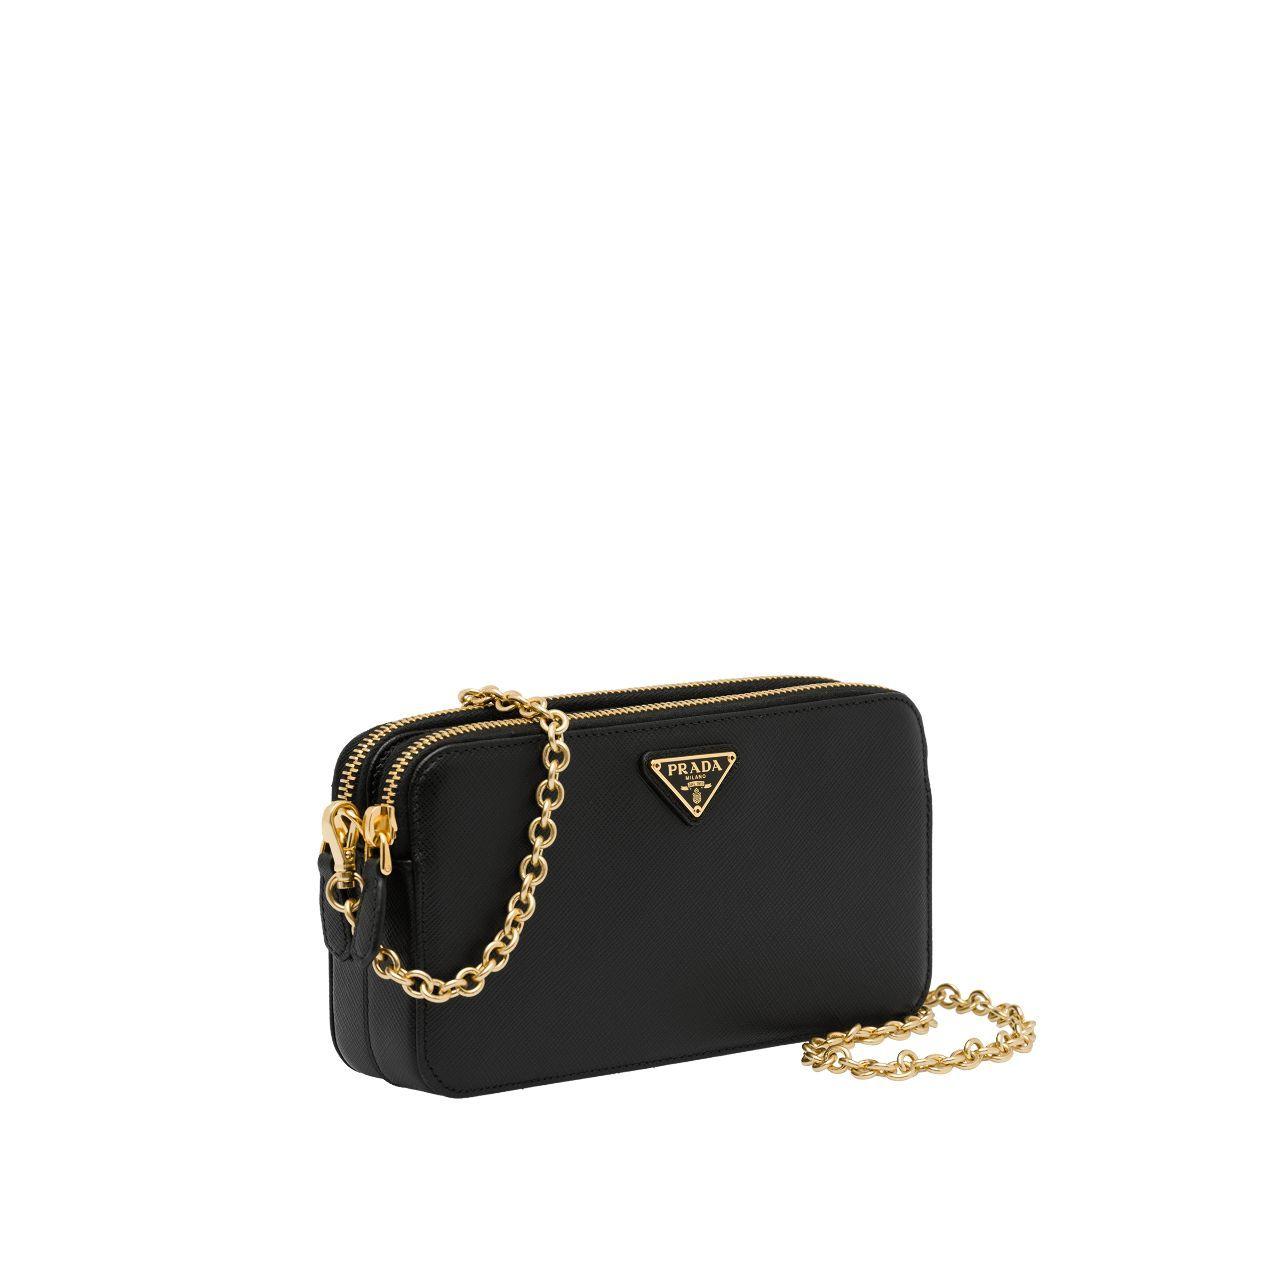 45b944b4 Saffiano leather mini shoulder bag in 2019 | Bags | Shoulder Bag ...